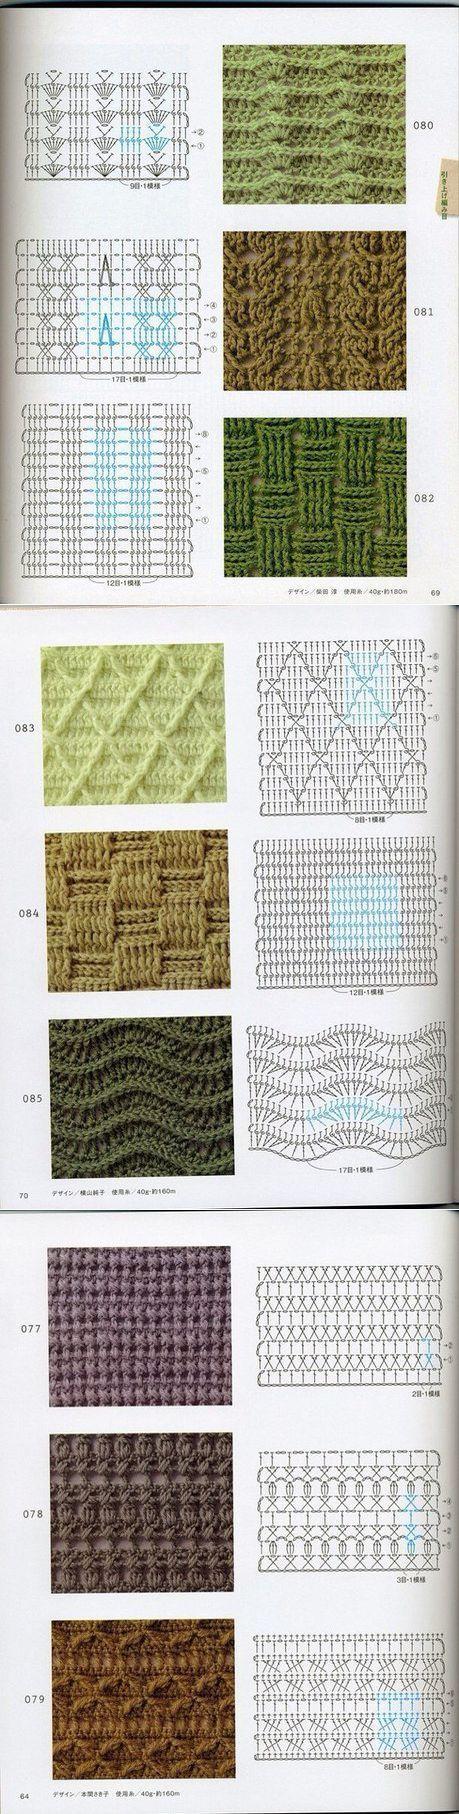 vk.com | crochet | Pinterest | Ganchillo, Puntadas y Puntos